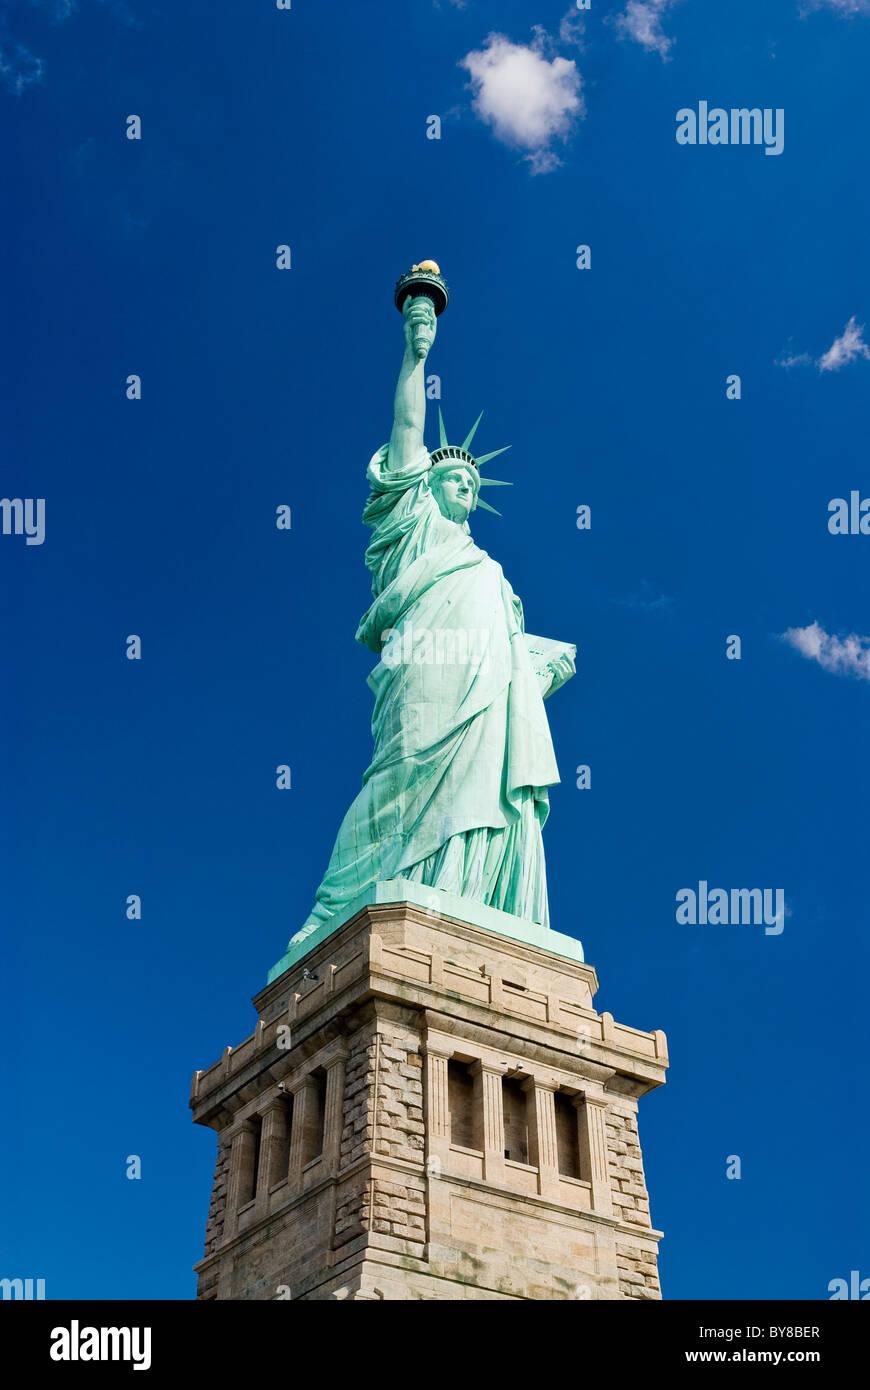 Statue of Liberty Stockbild